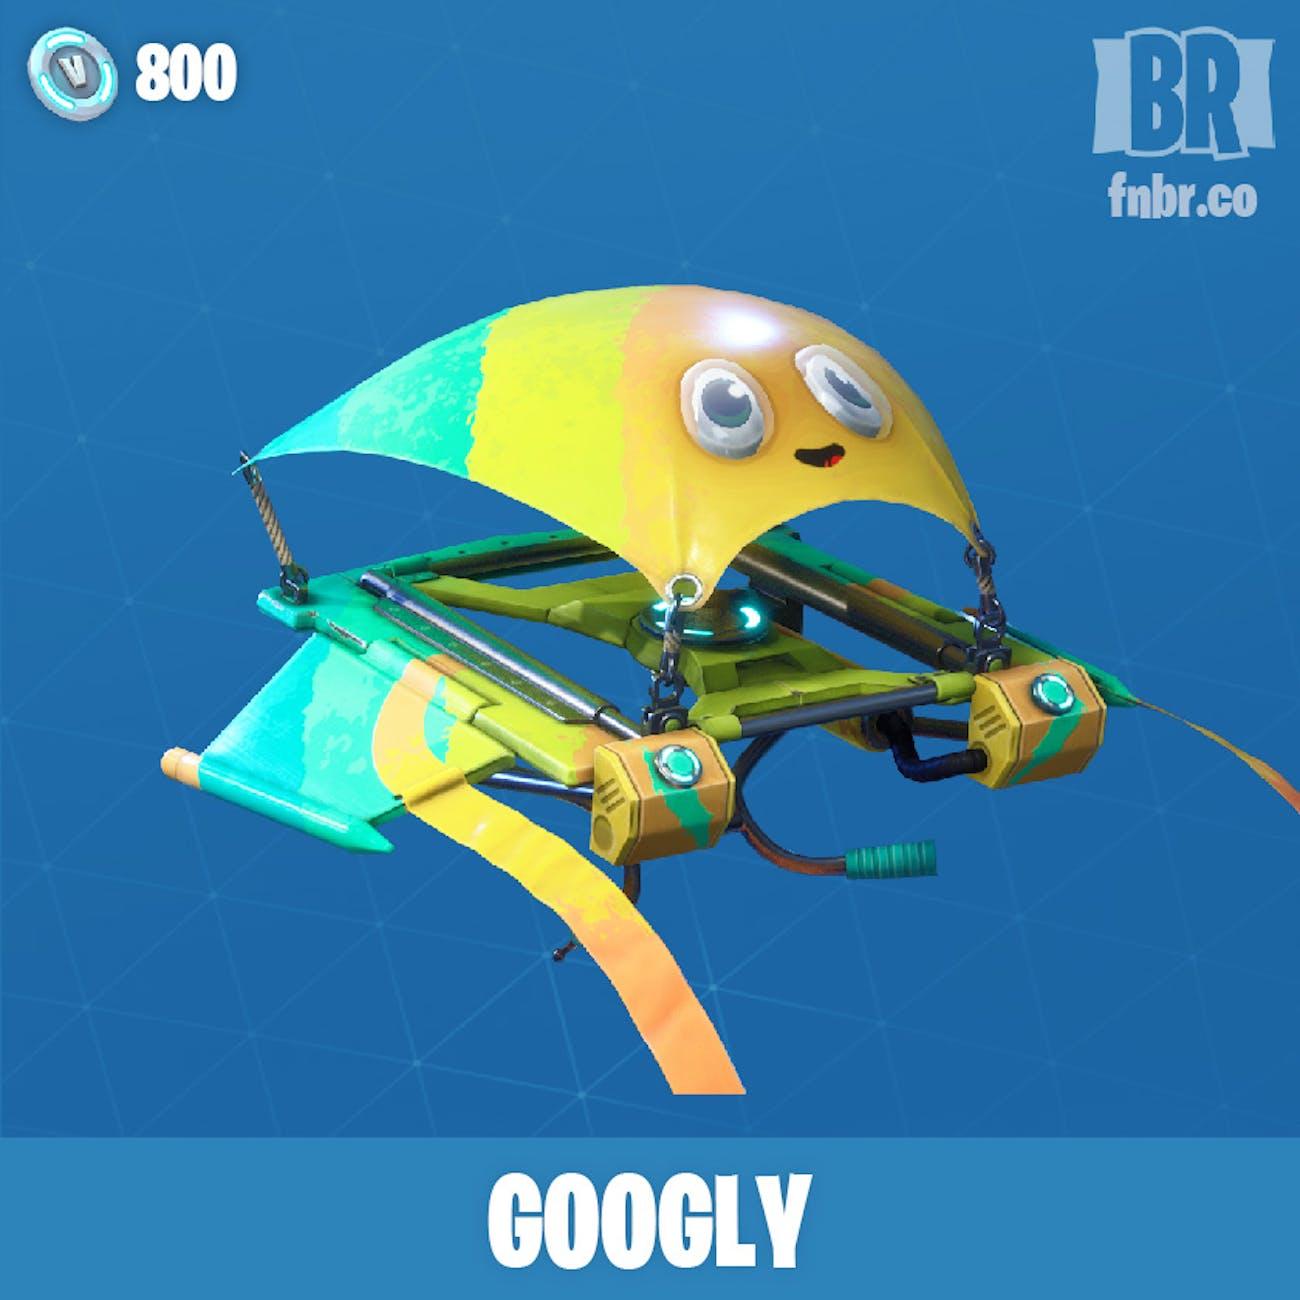 'Fortnite' Googly Glider